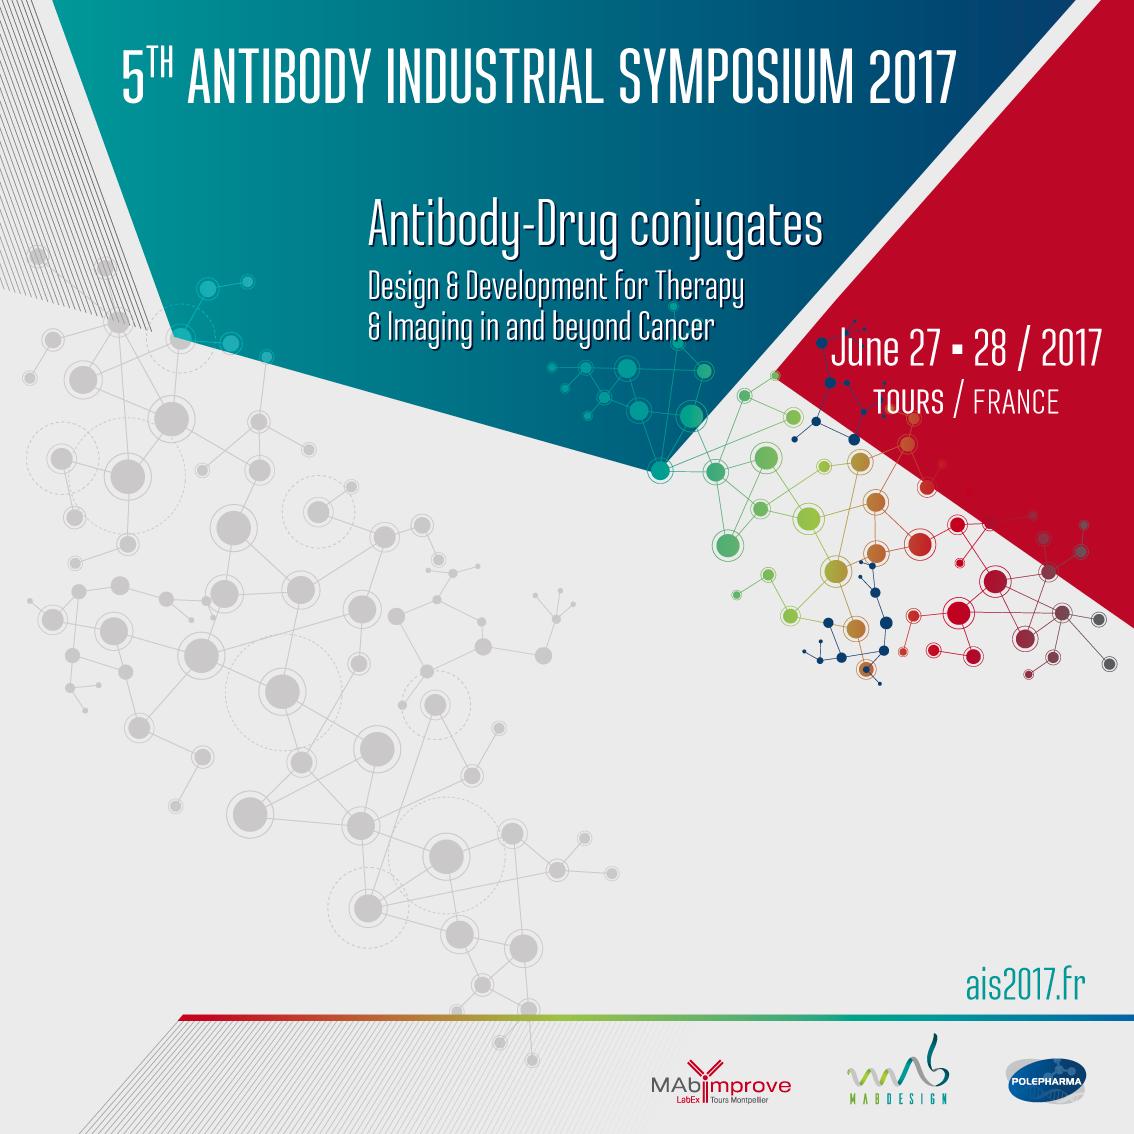 5th antibody industrial symposium 2017